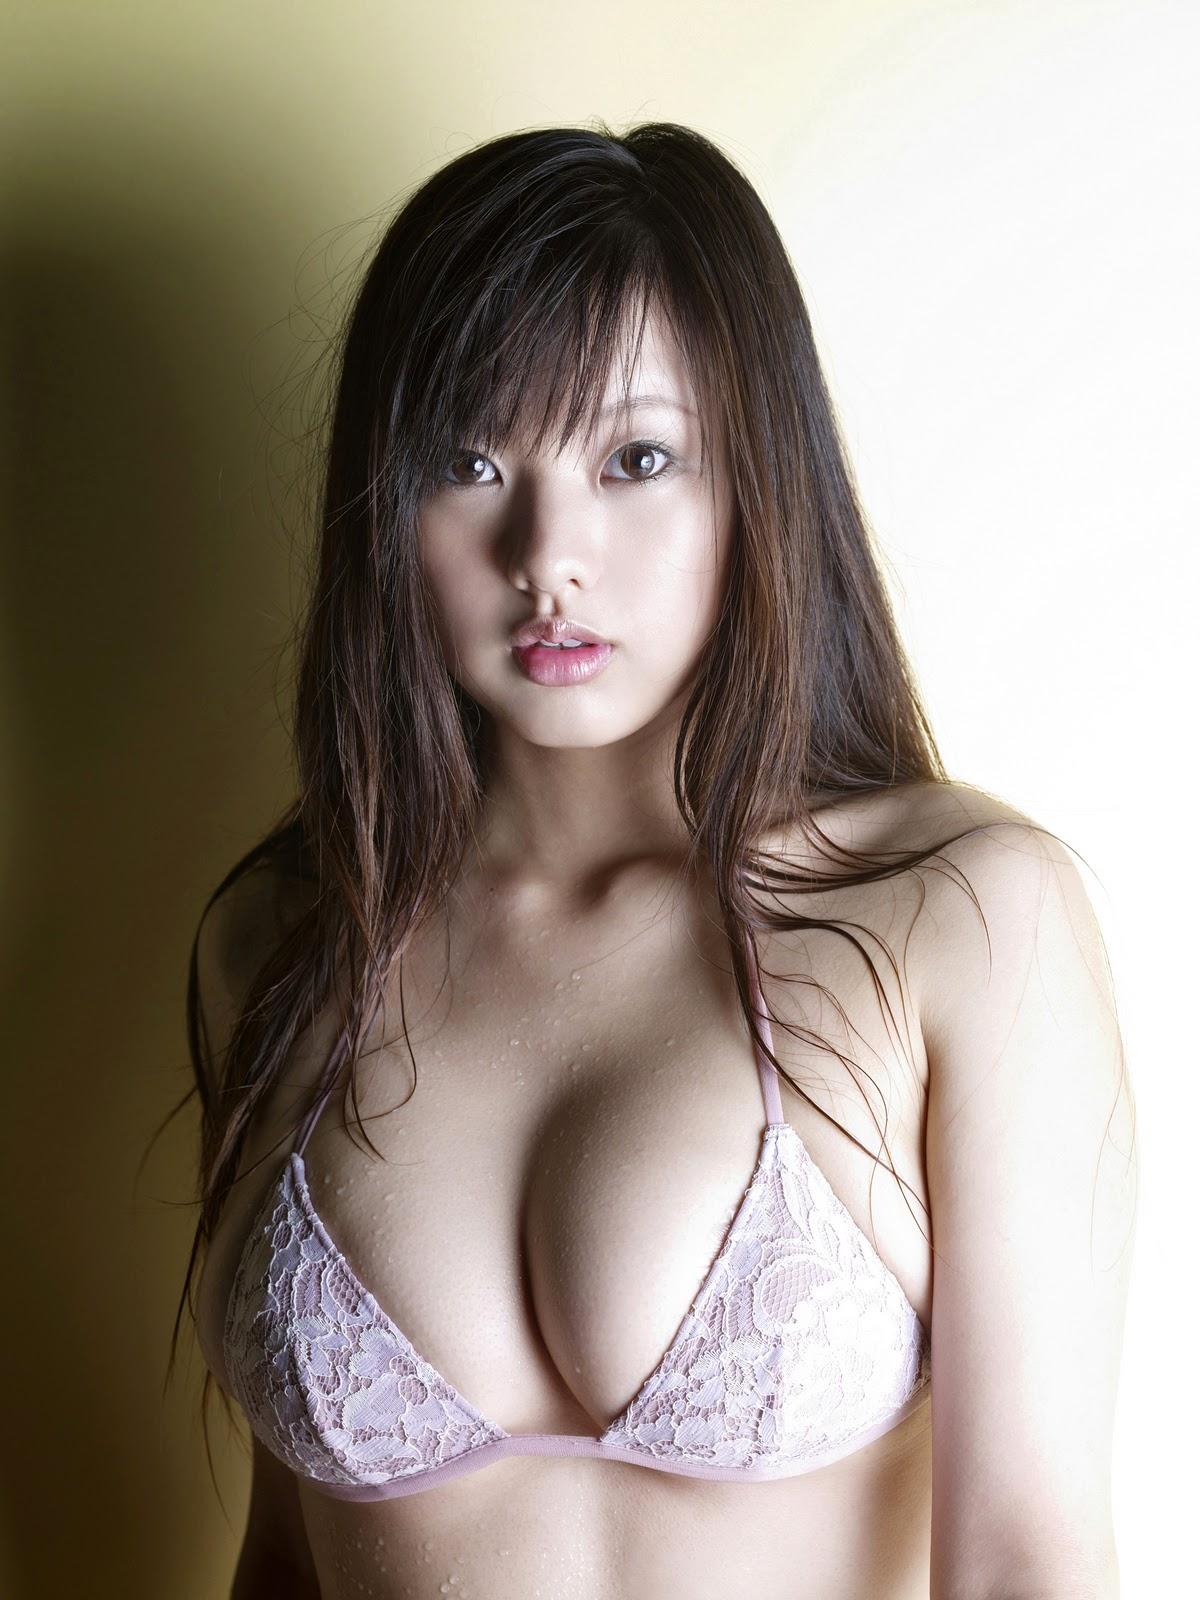 Японскии девушки у гинеколога 8 фотография